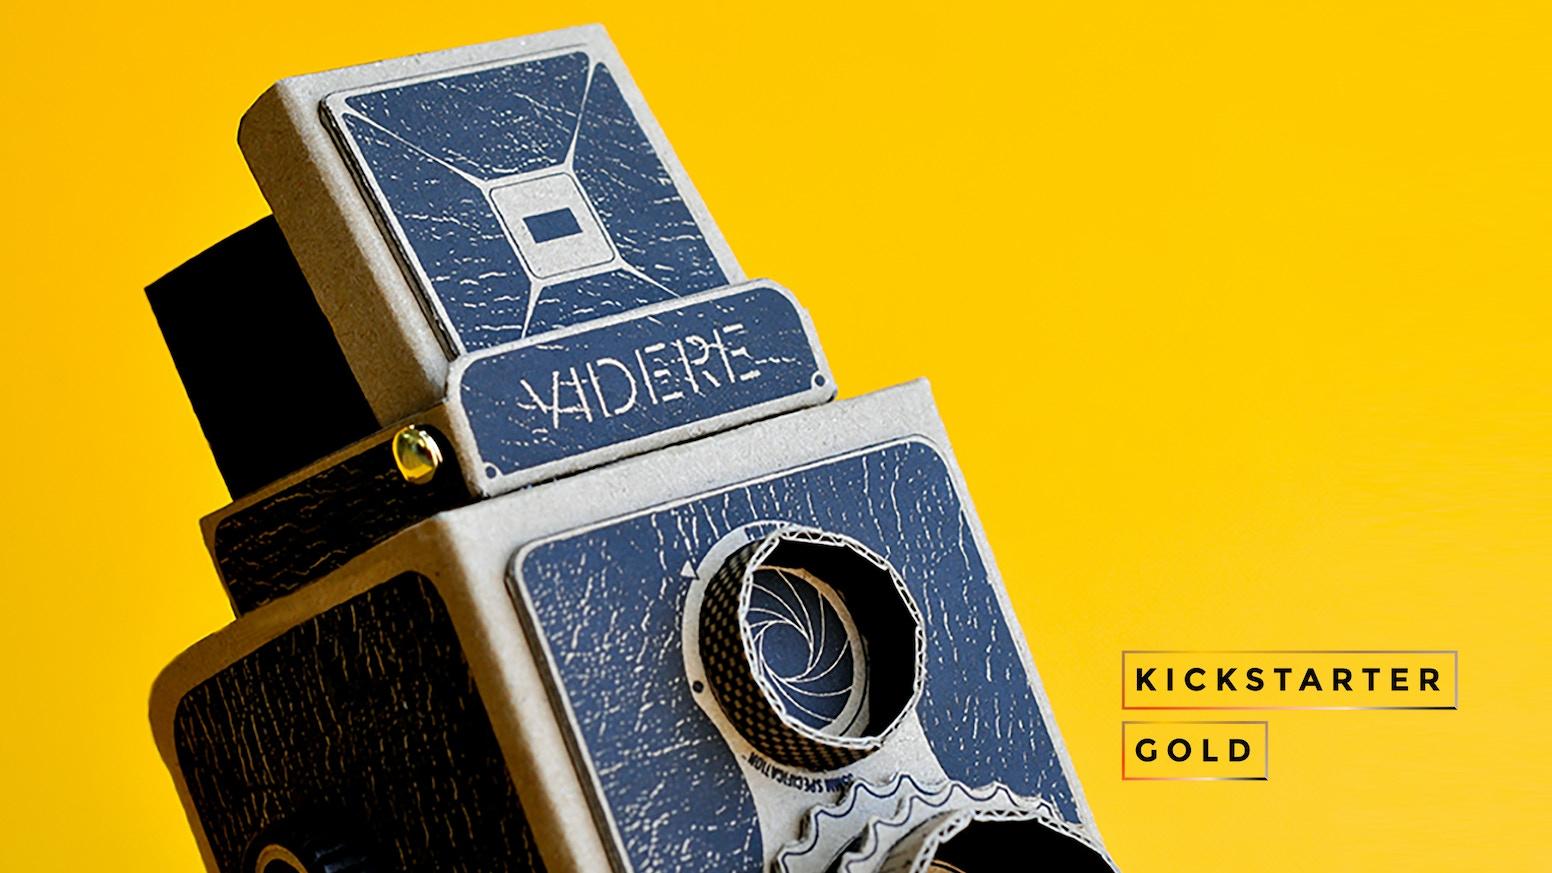 Kickstarter Gold Videre 35mm Diy Pinhole Camera Kit By Kelly Angood